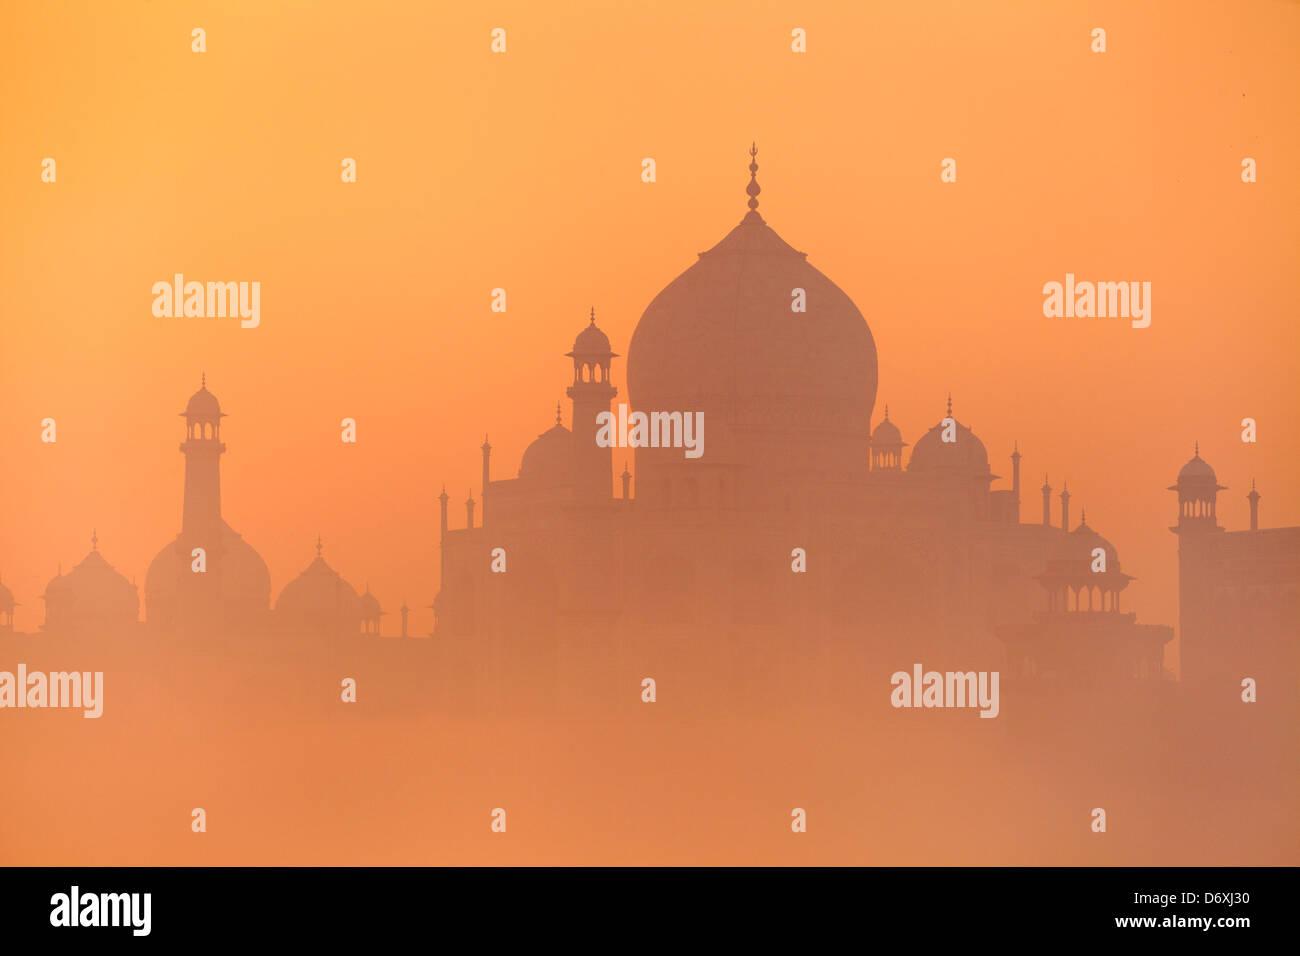 Taj Mahal bei Abenddämmerung Skyline (nördliche Blick des Taj Mahal), Agra, Uttar Pradesh, Indien Stockbild